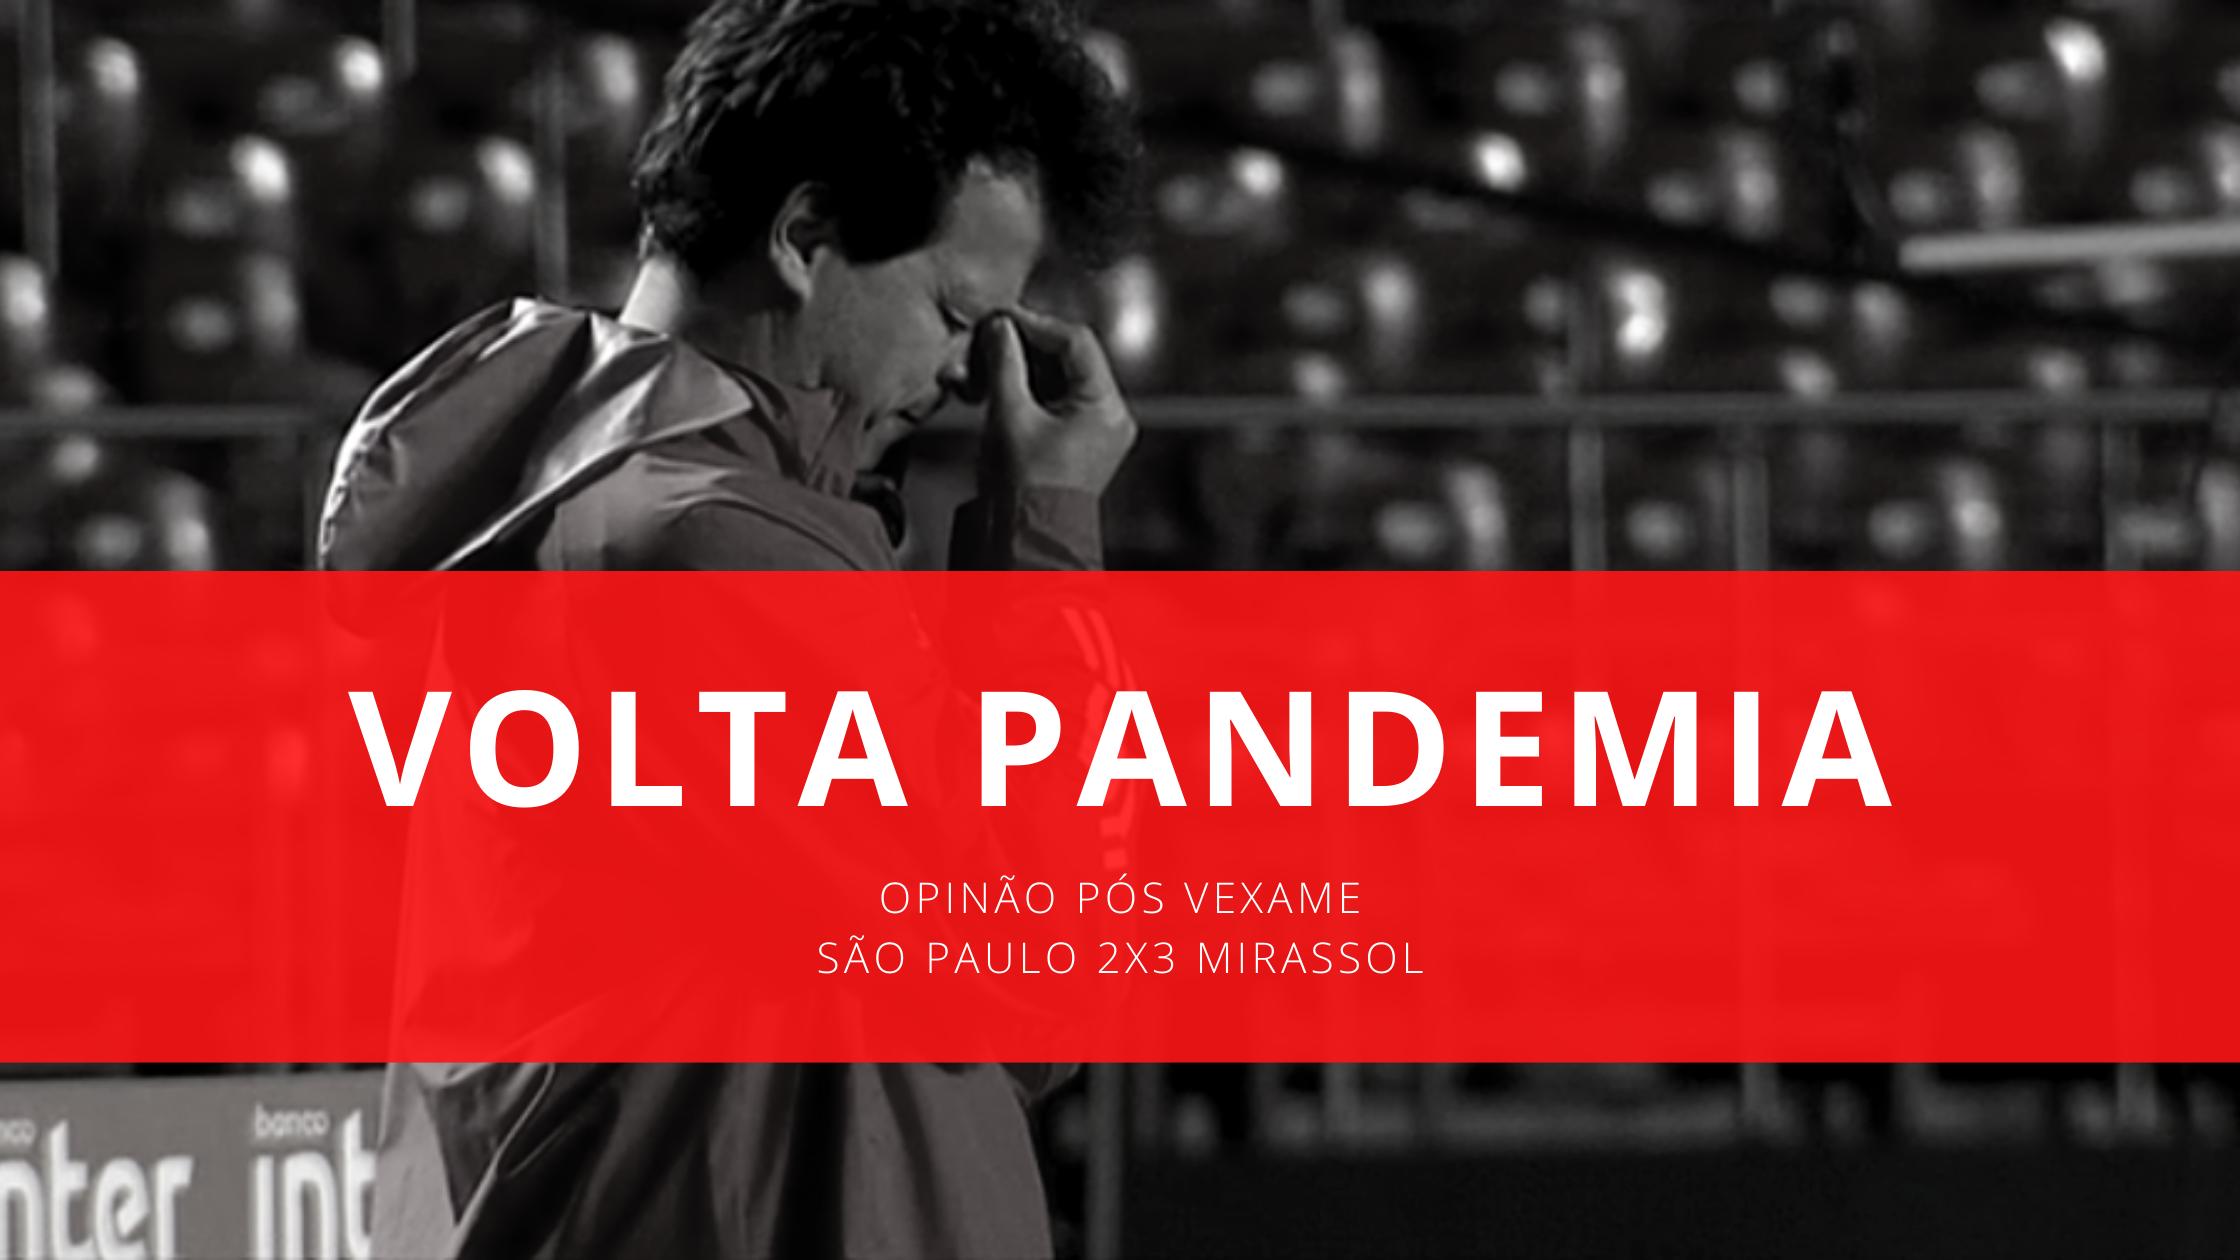 Volta Pandemia